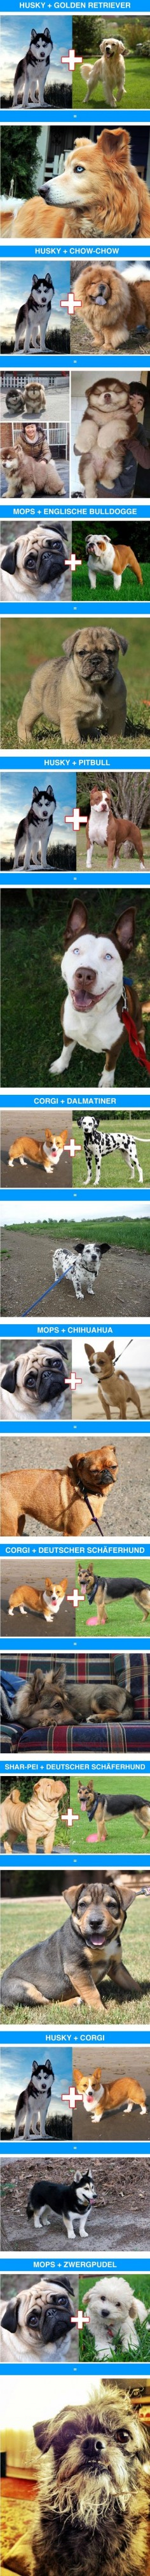 Cute & funny cross-breeds